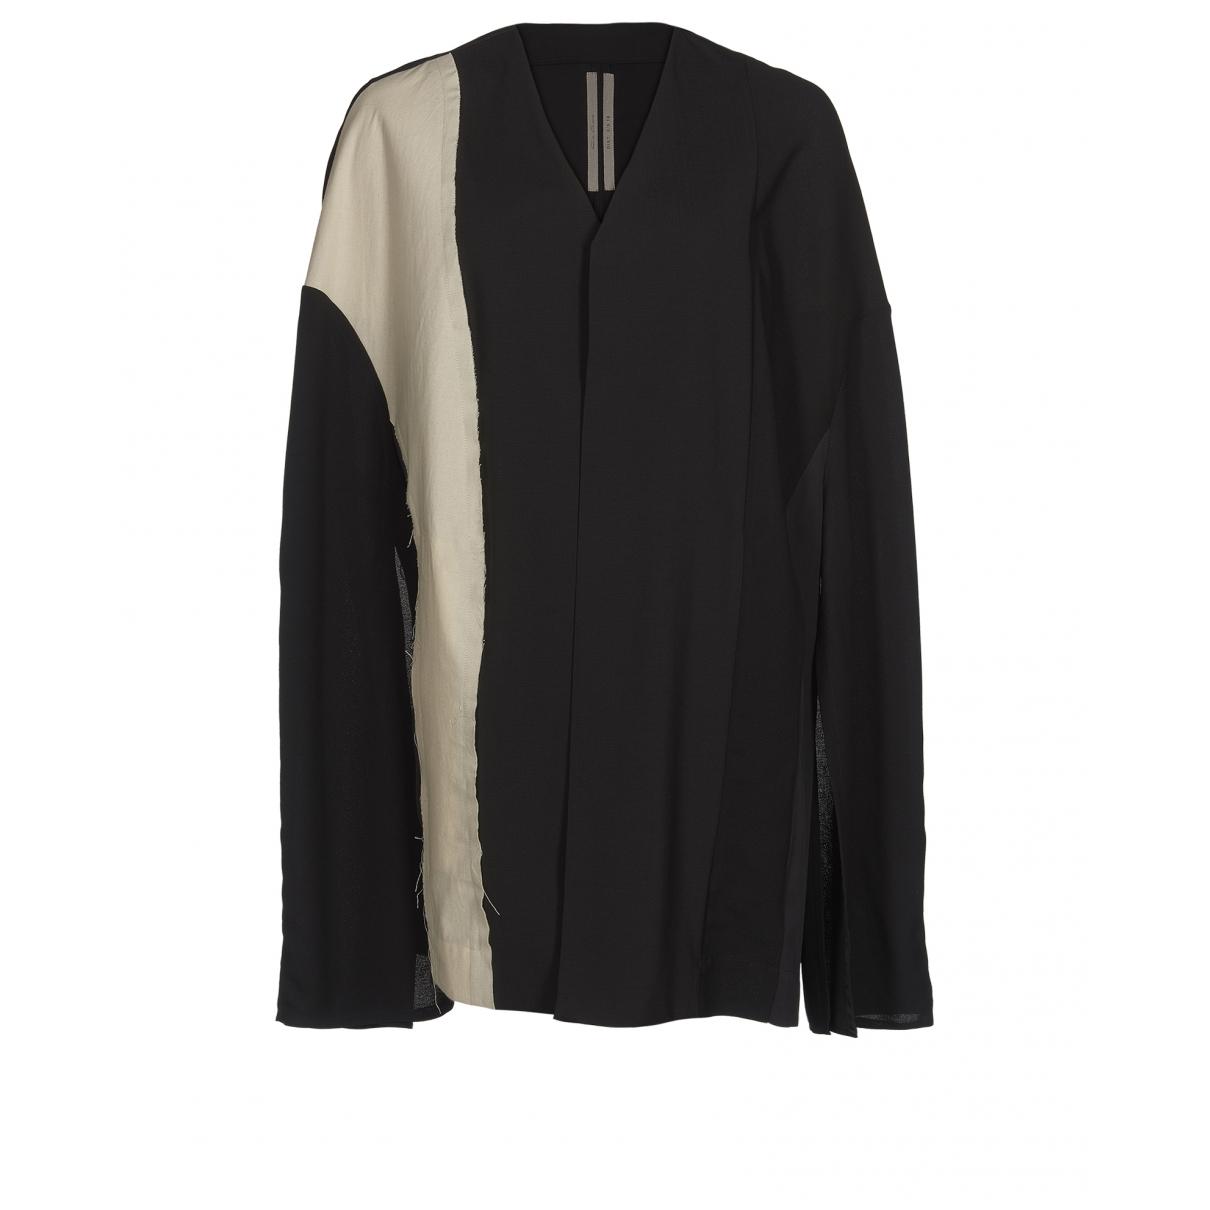 Rick Owens N Black jacket for Women 8 UK